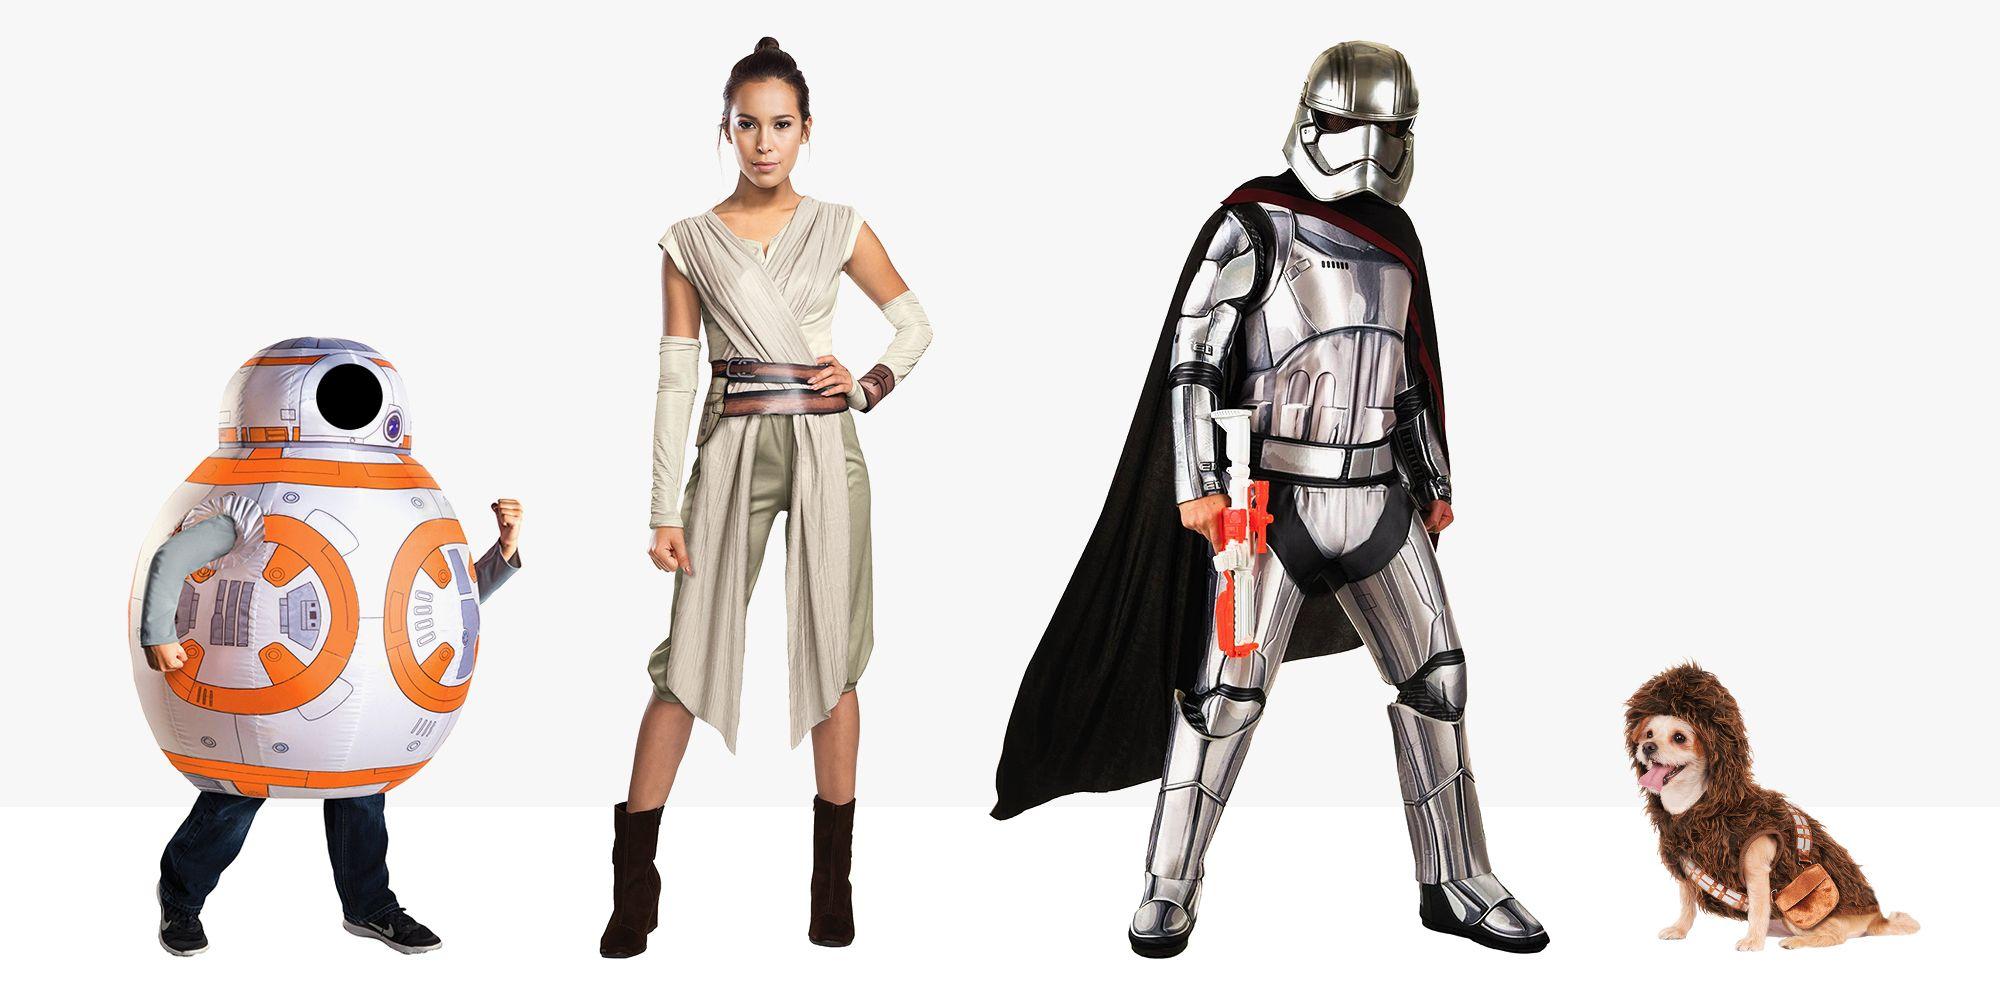 15 Best Star Wars Costumes For Halloween 2018 Star Wars Costume